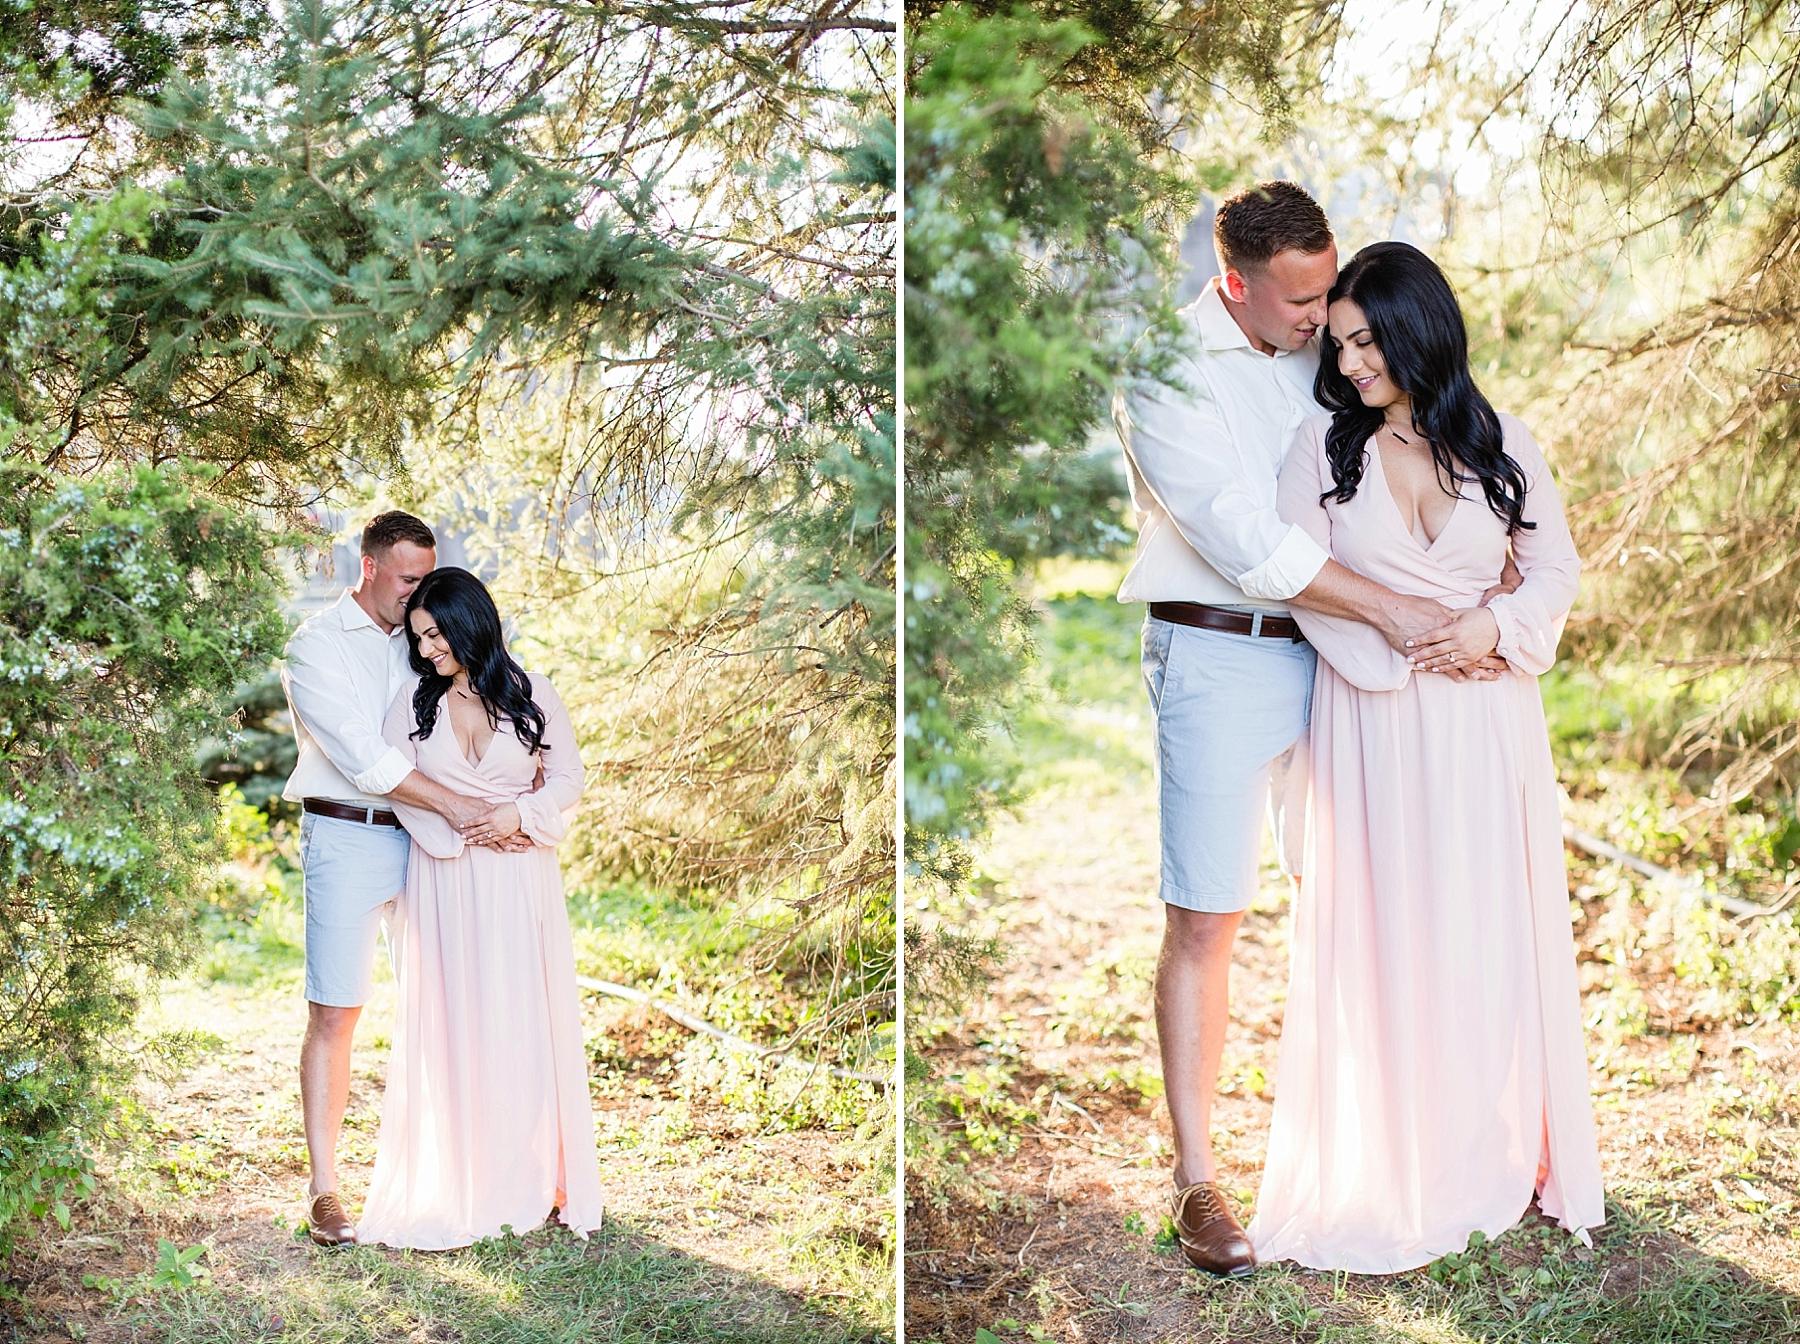 windsor-wedding-engagement-photographer-eryn-shea-photography-field-of-flowers_0003.jpg